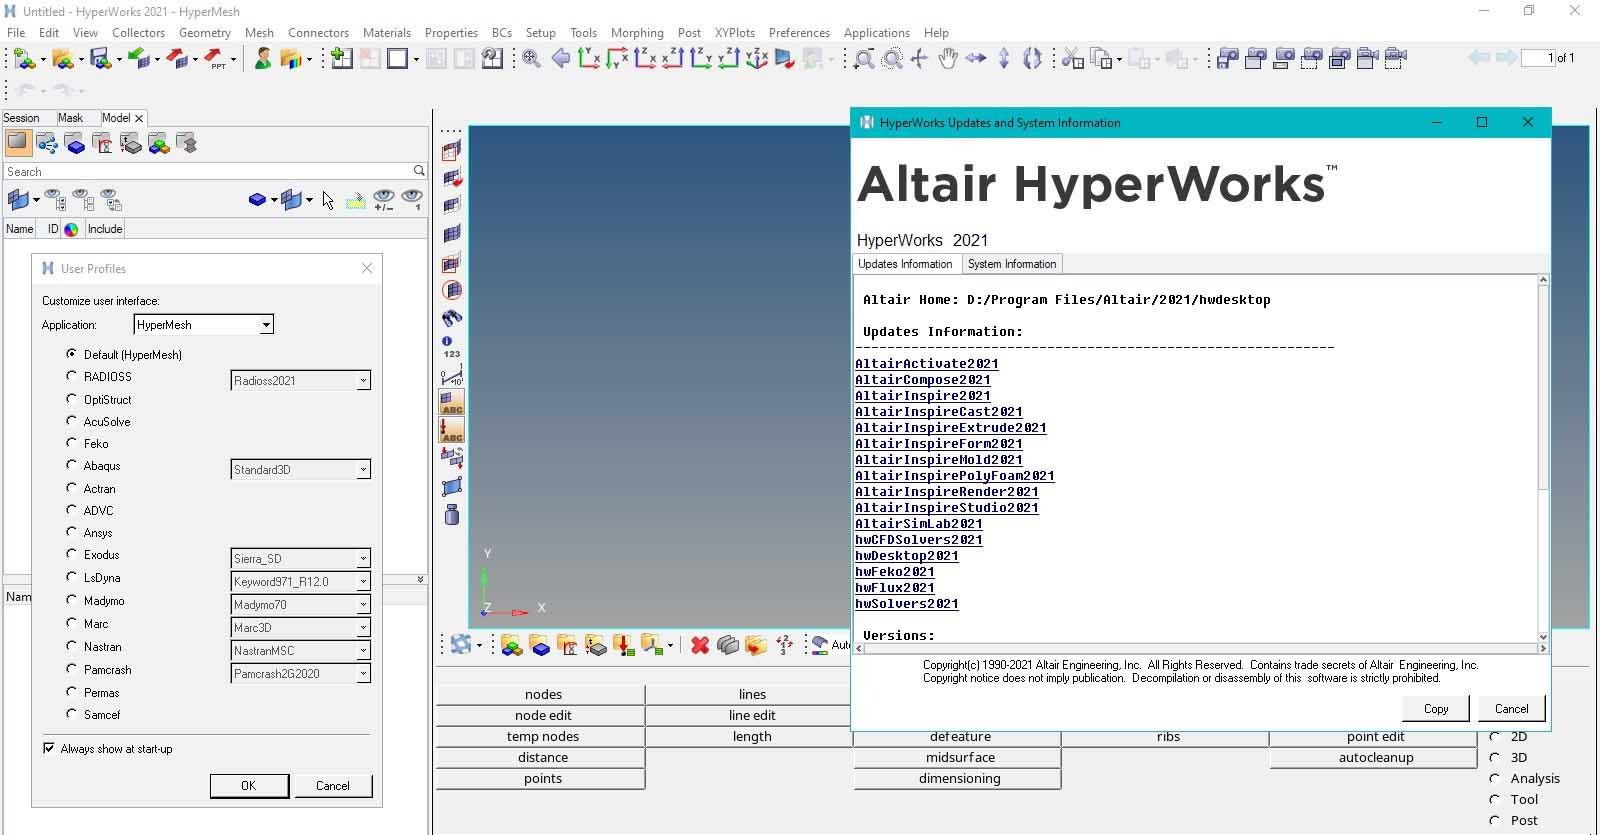 HyperWorks screenshot